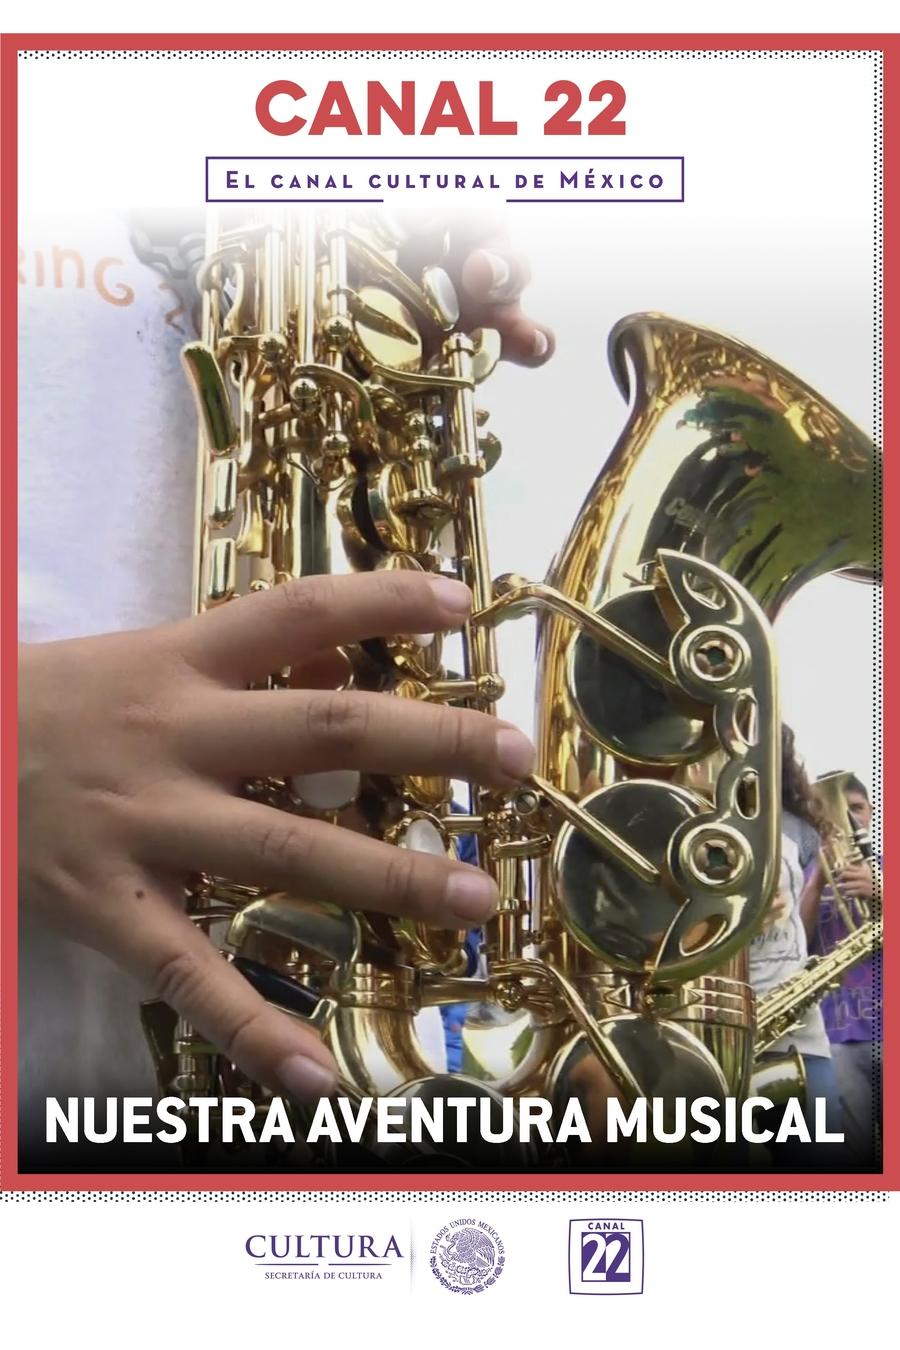 Nuestra aventura musical